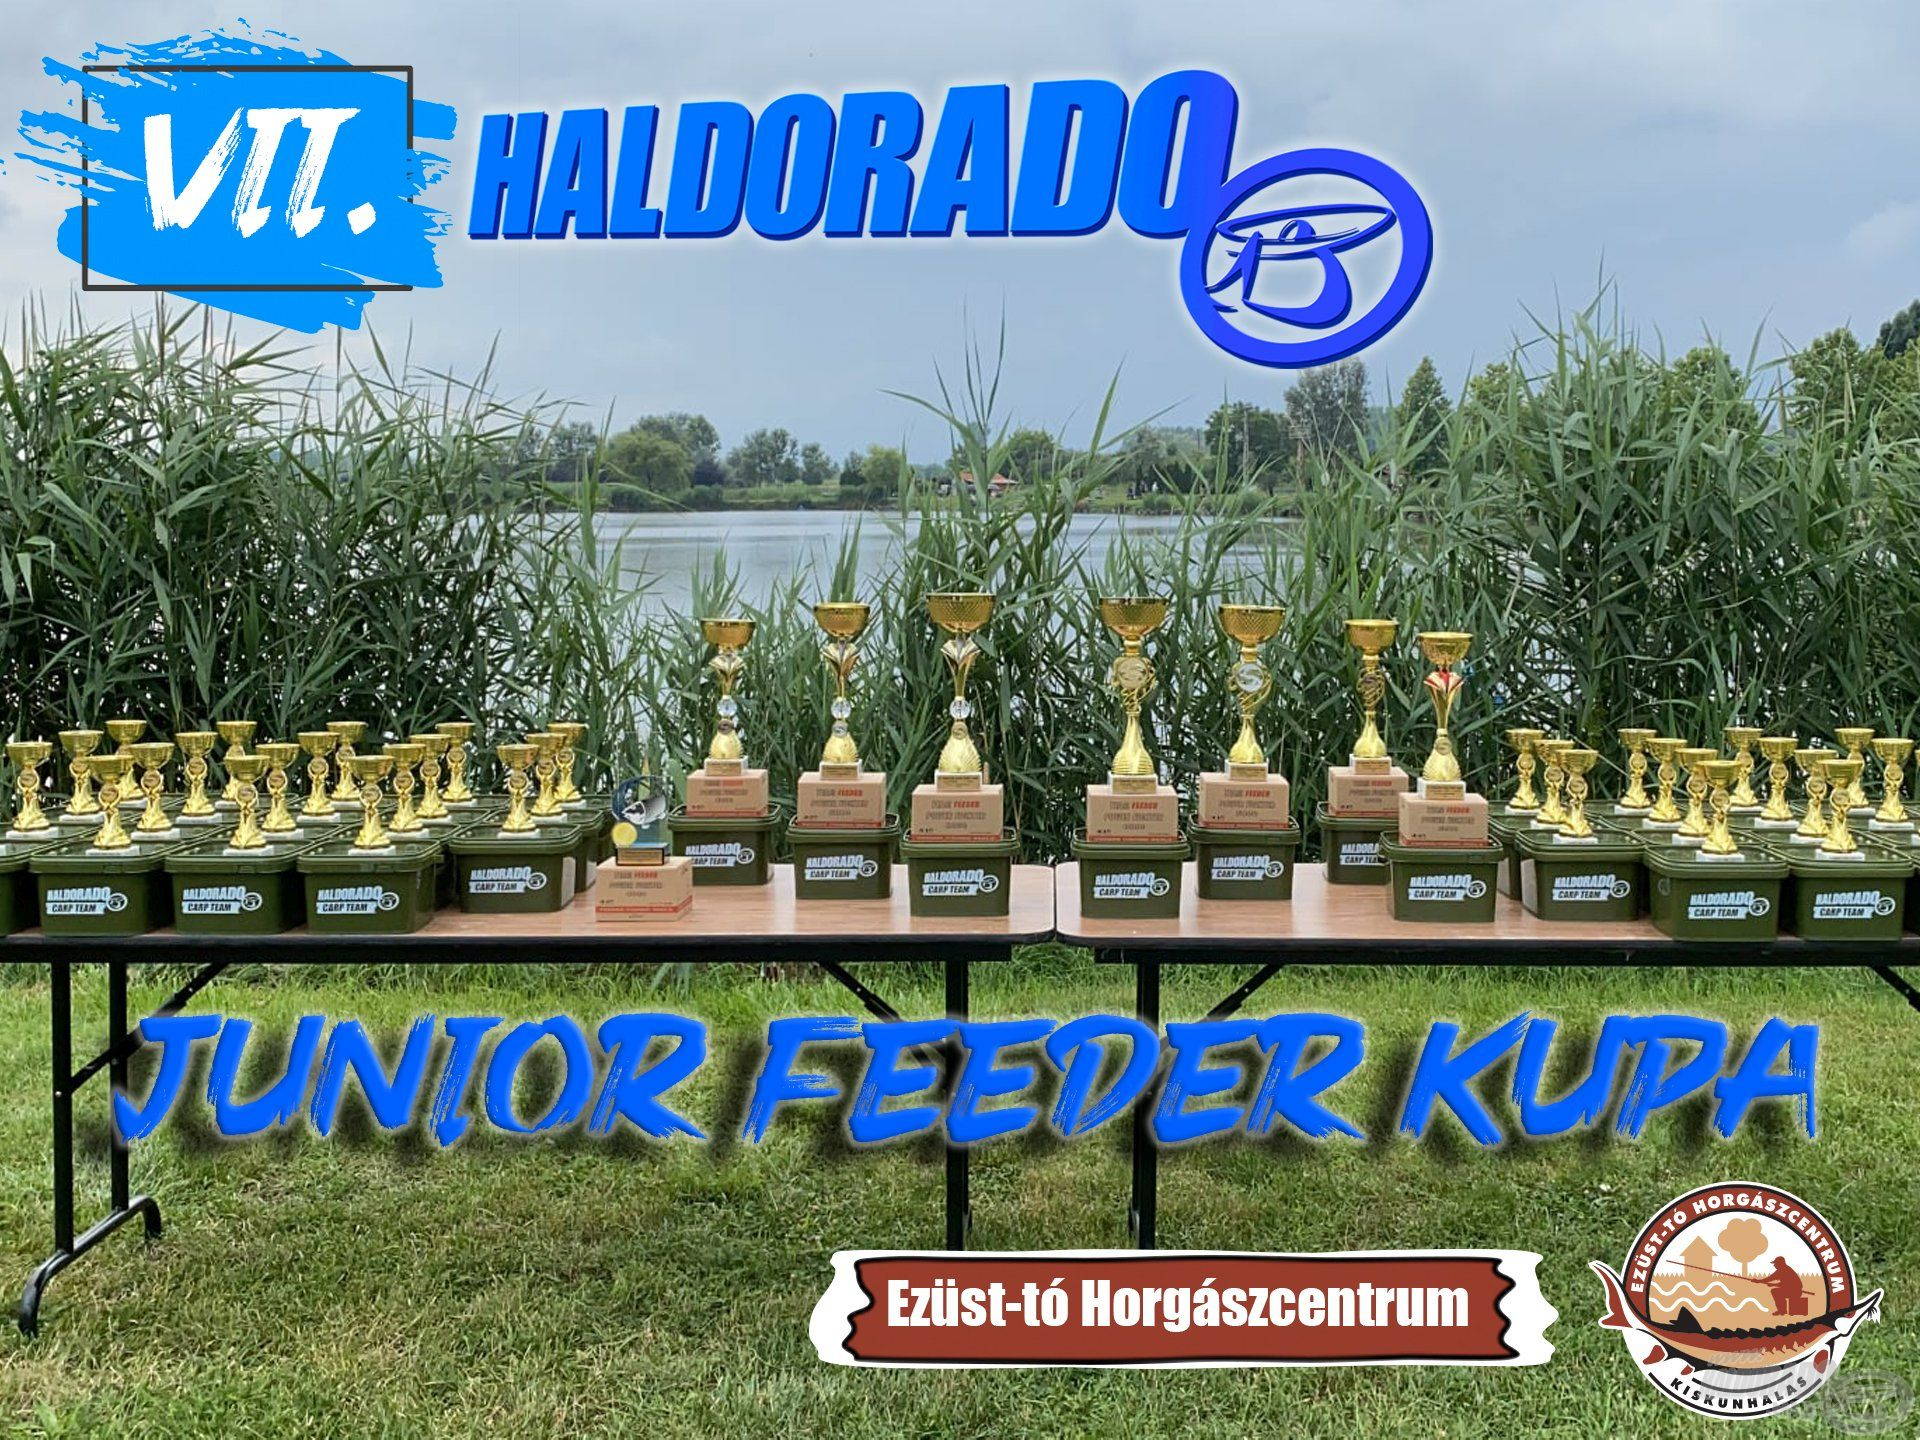 Találkozzunk a VII. Haldorádó Junior Feeder Kupán!